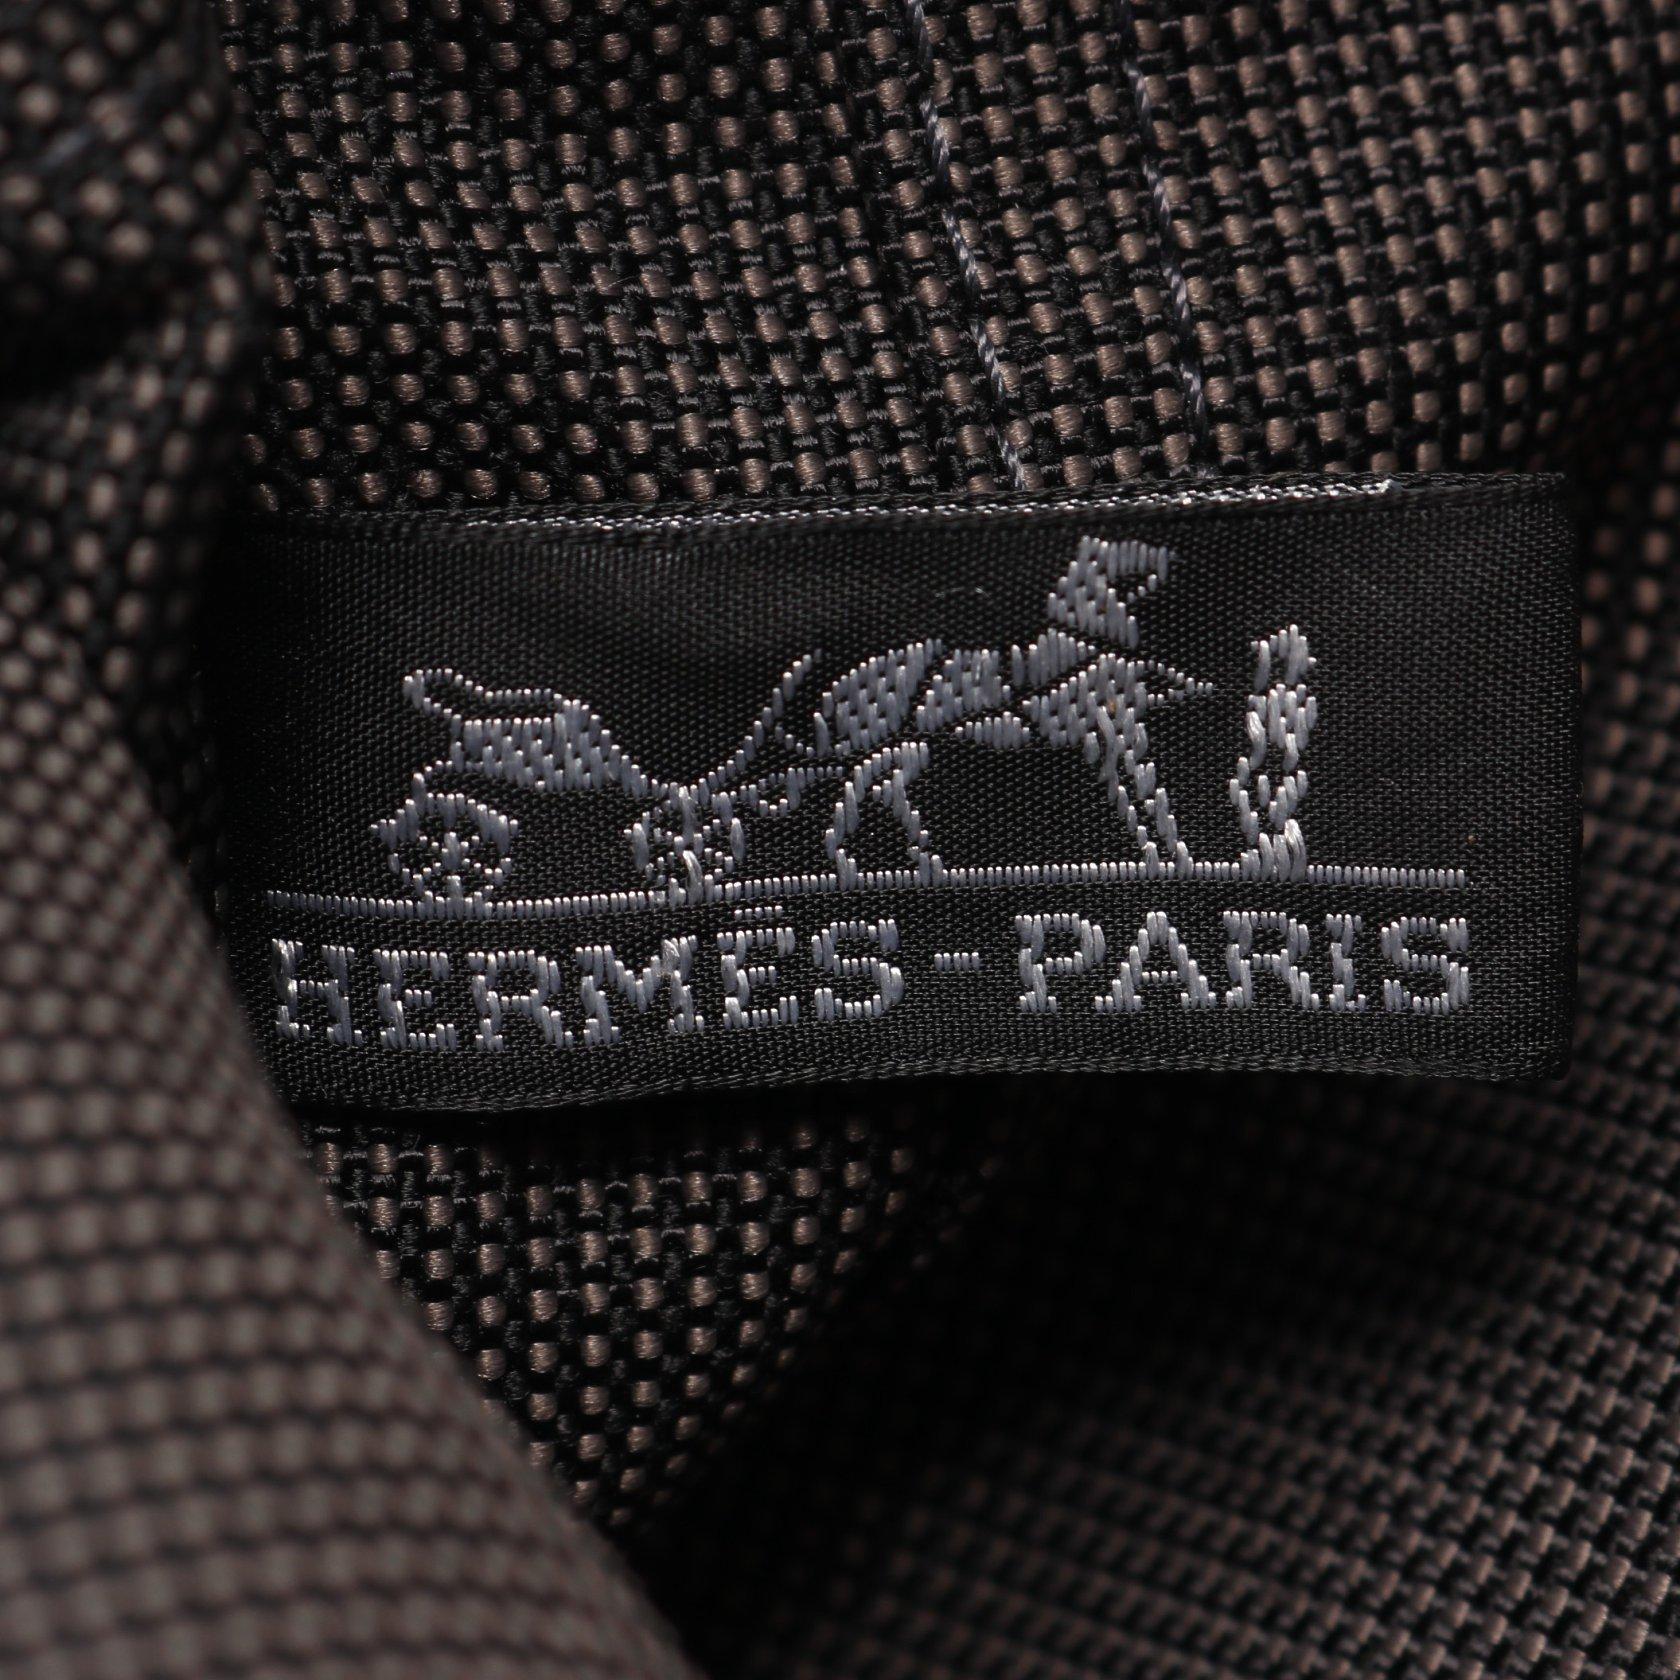 HERMES・バッグ・エールラインPM ハンドバッグ トートバッグ ナイロンキャンバス ダークグレー